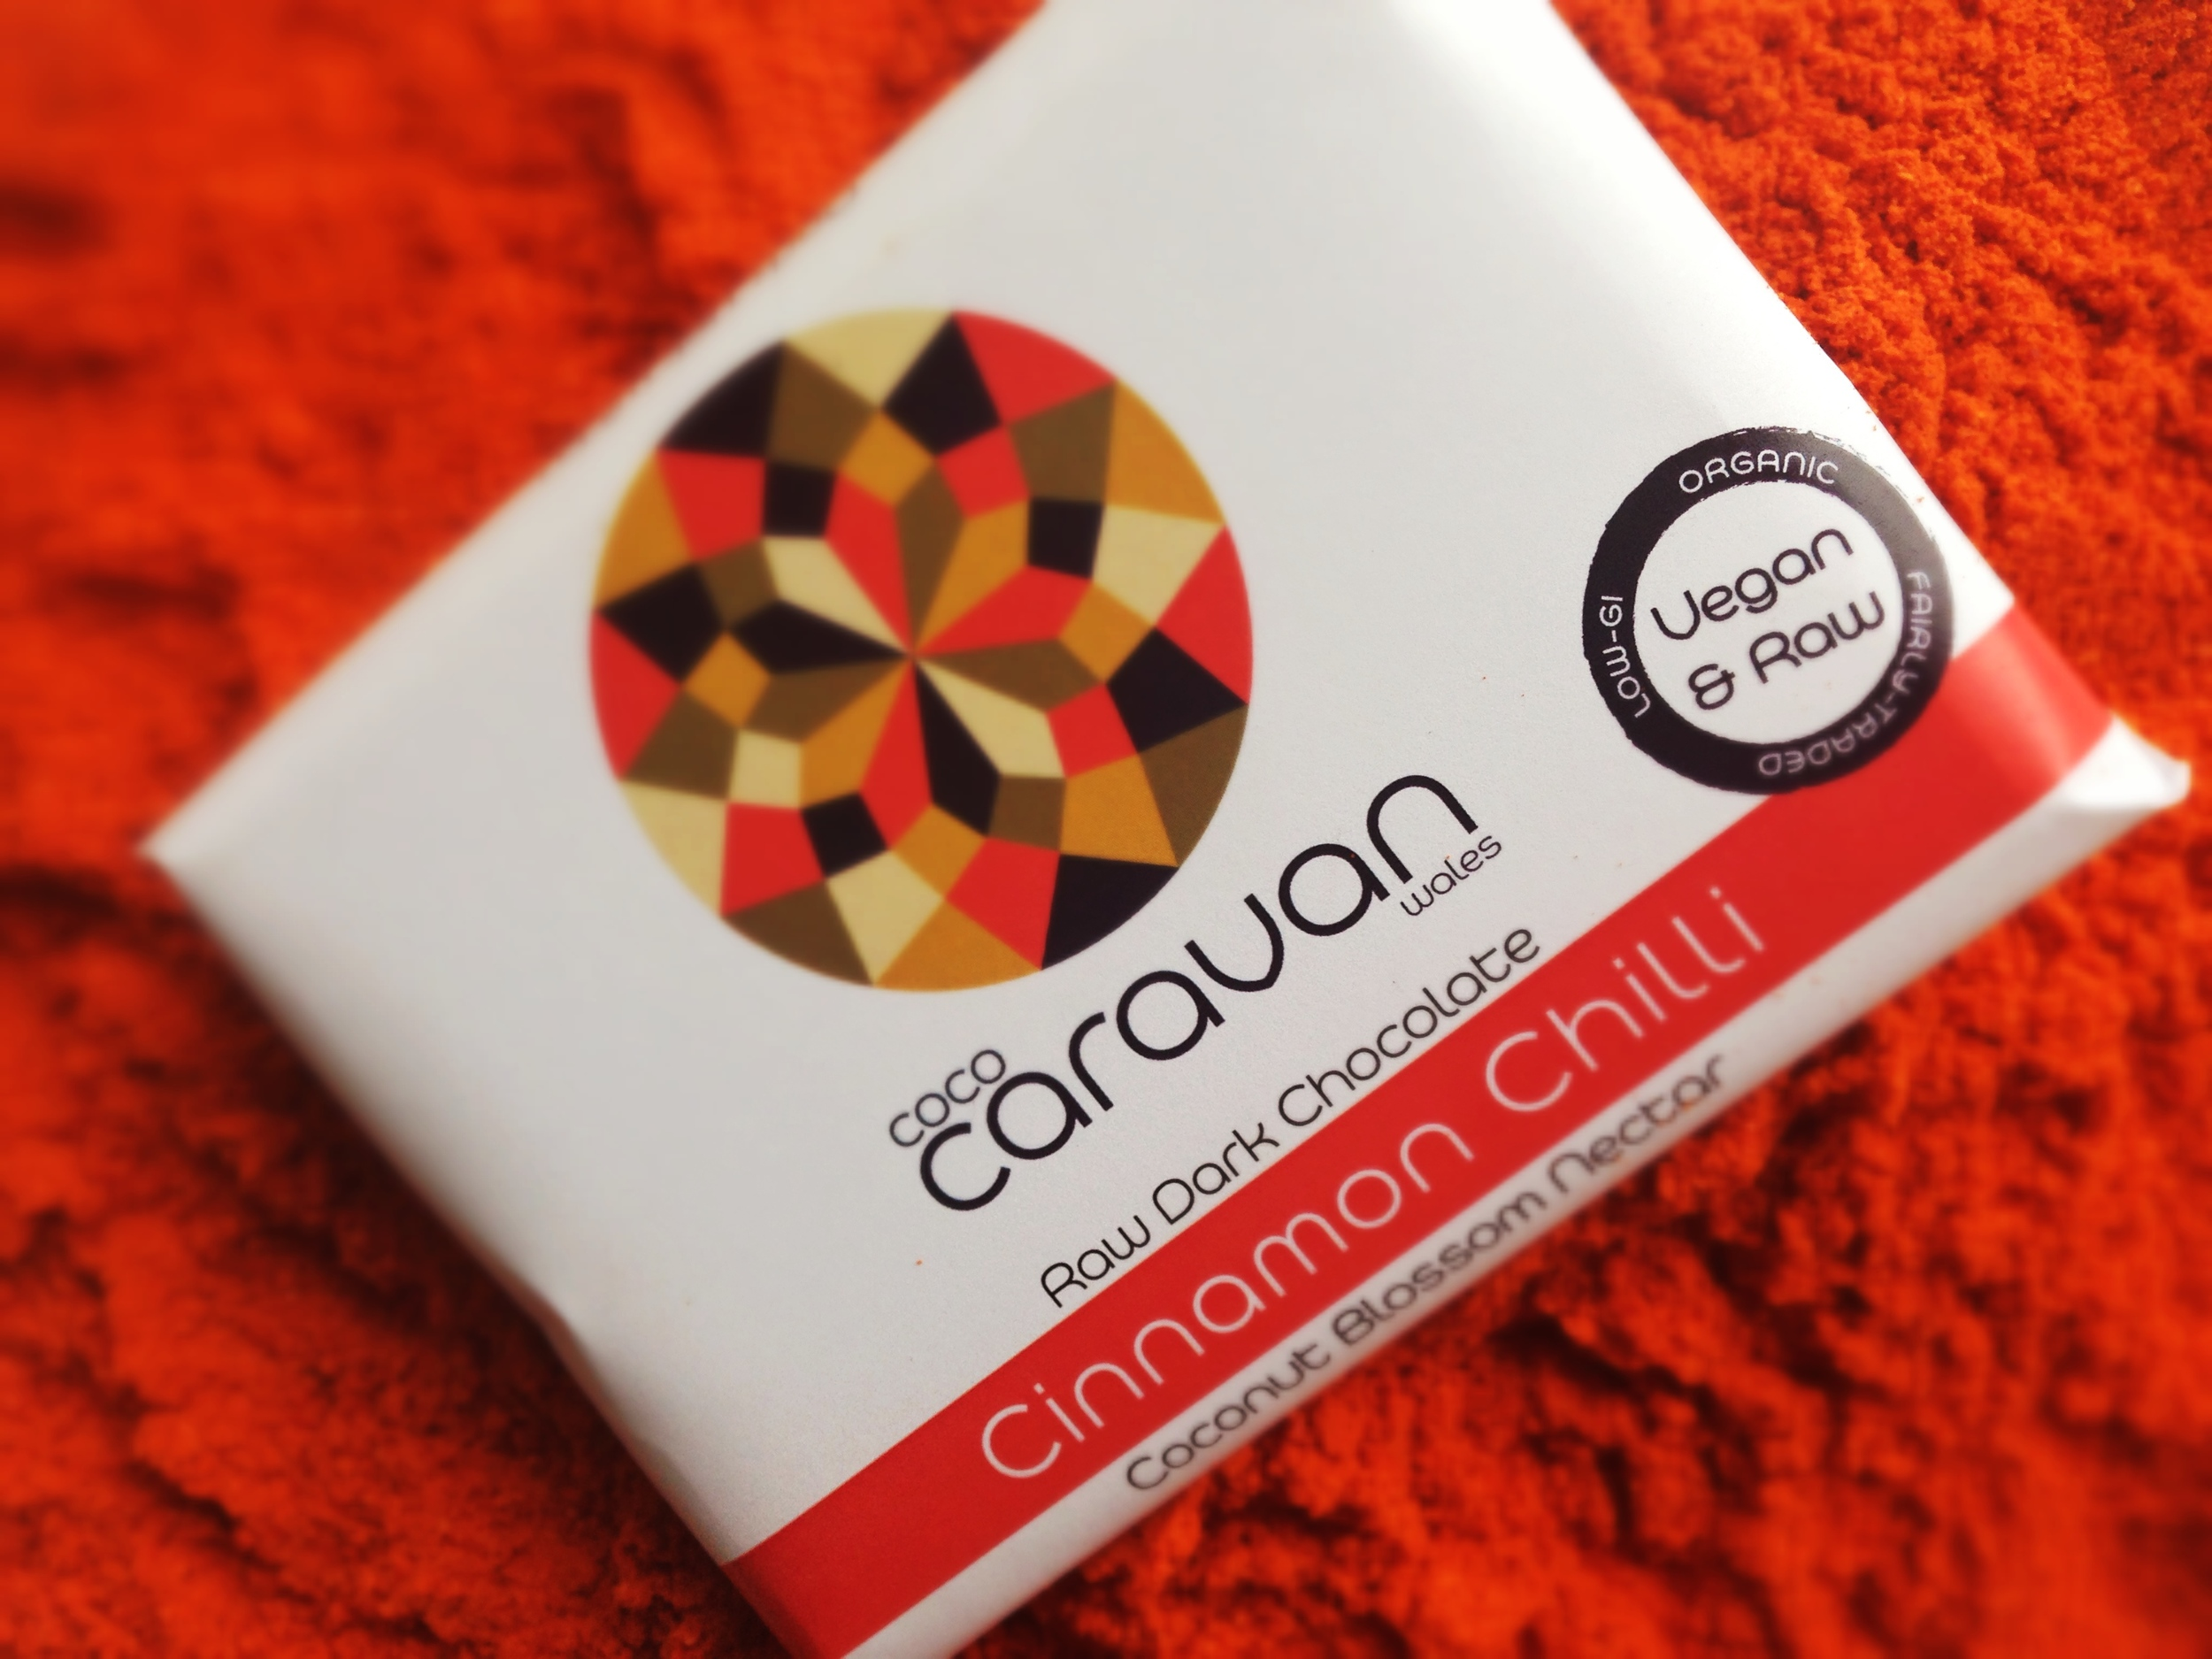 Cinnamon and Chilli Raw Chocolate